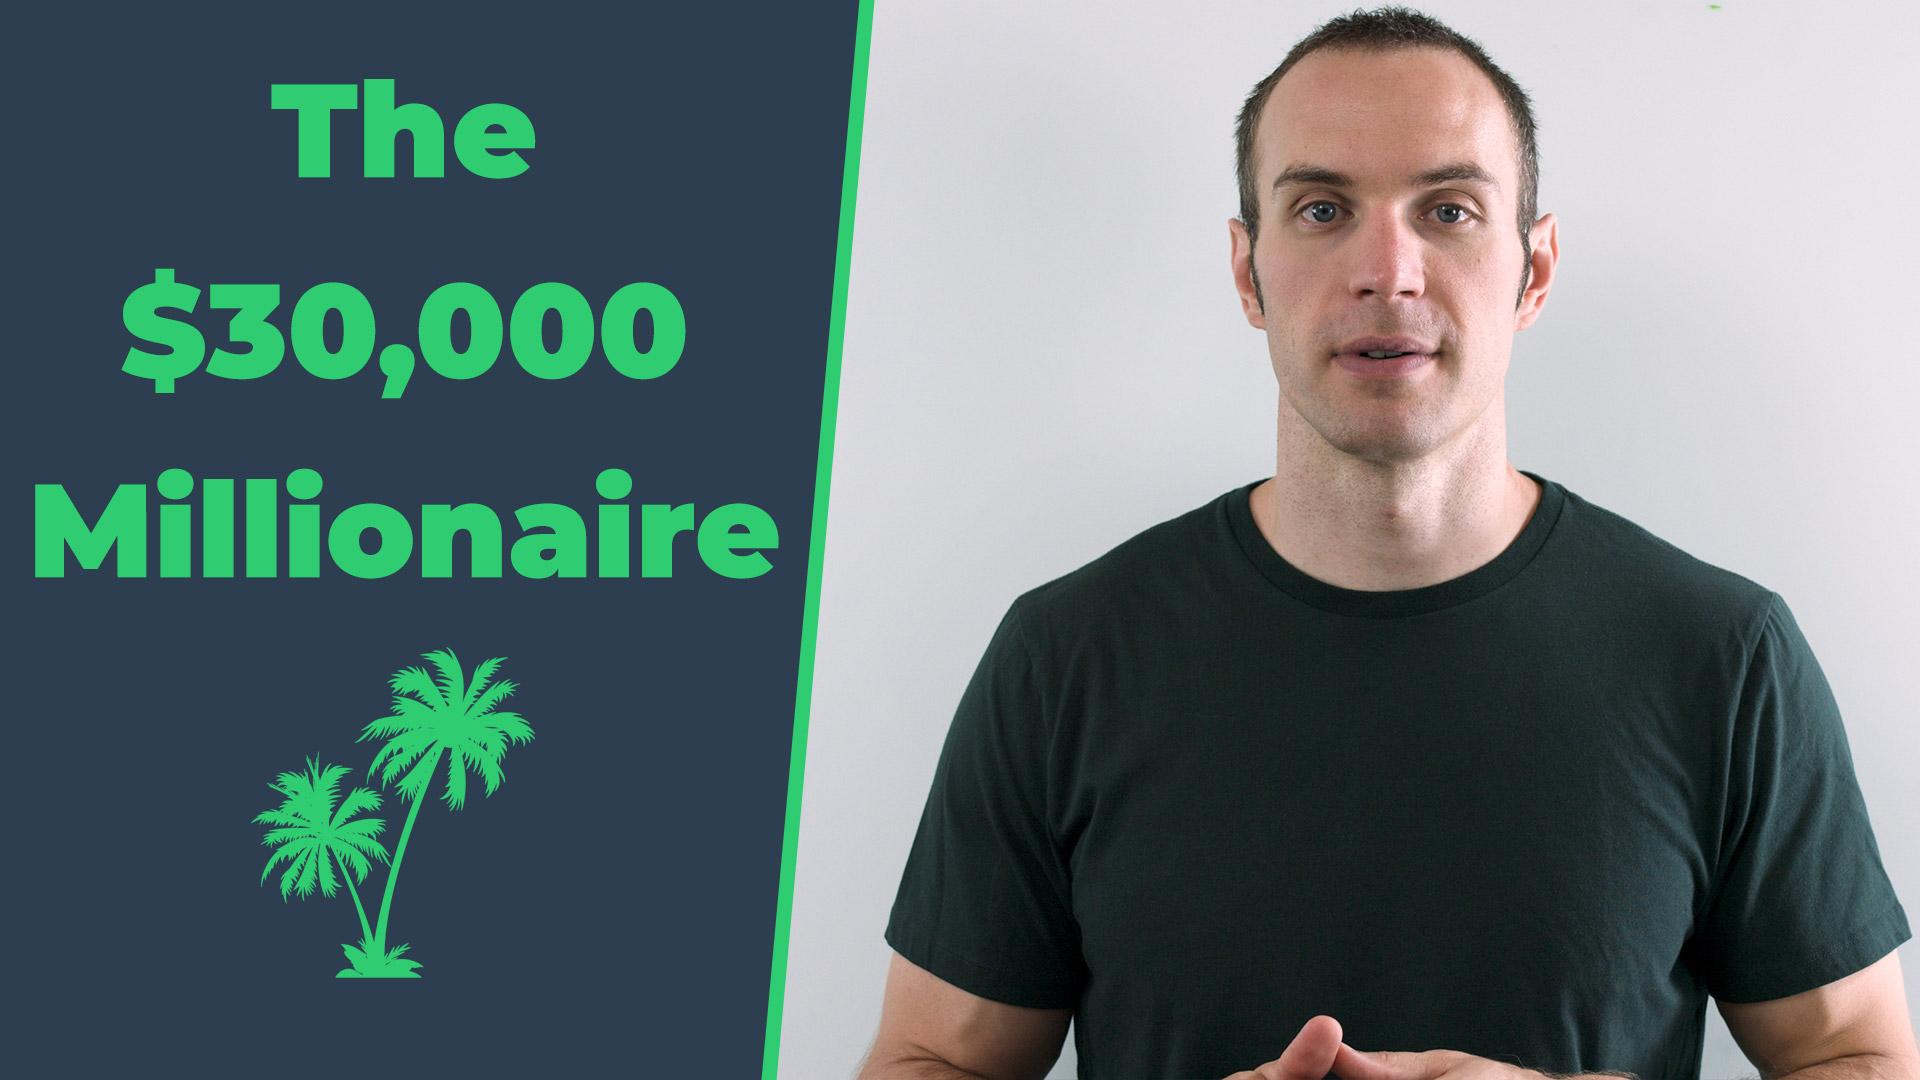 The $30,000 Millionaire